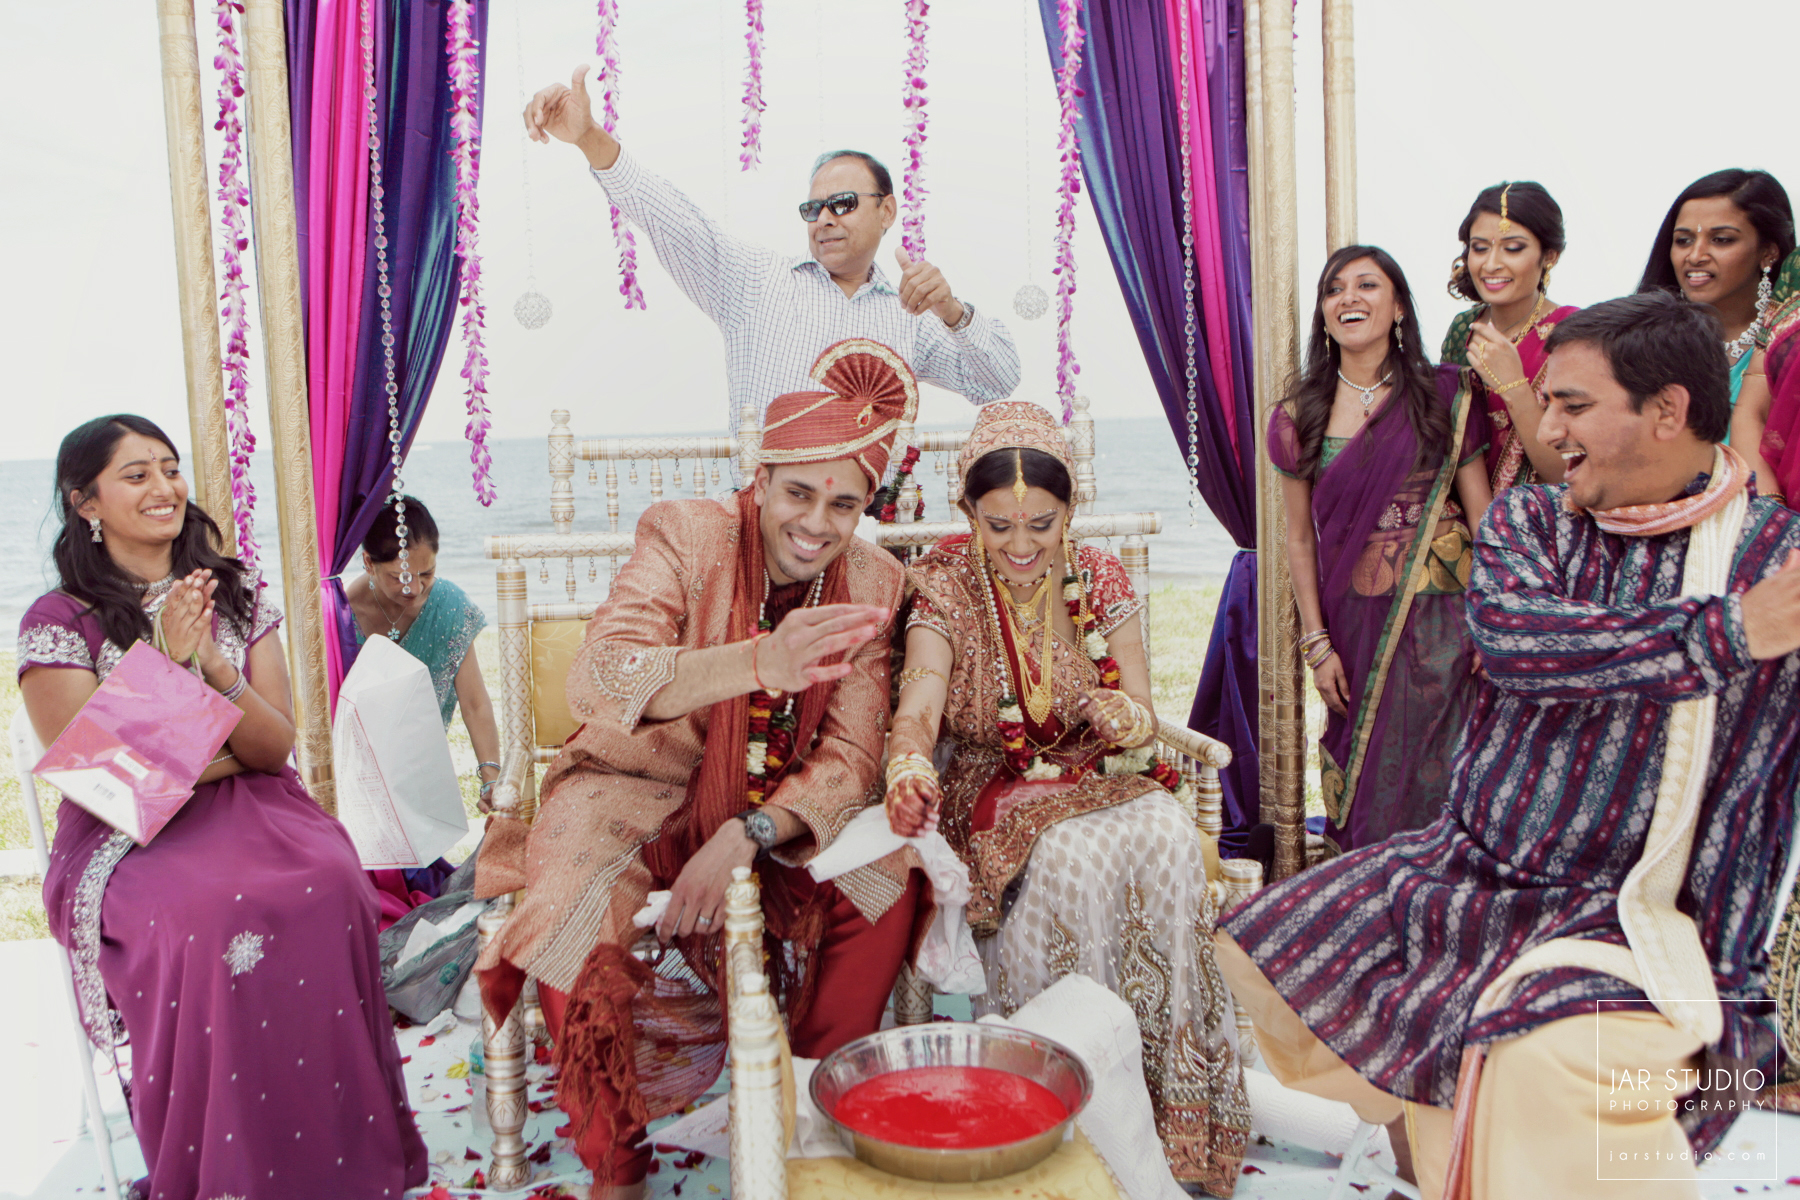 42-hindu-wedding-ceremony-decor-jarstudio-photography-orlando.JPG